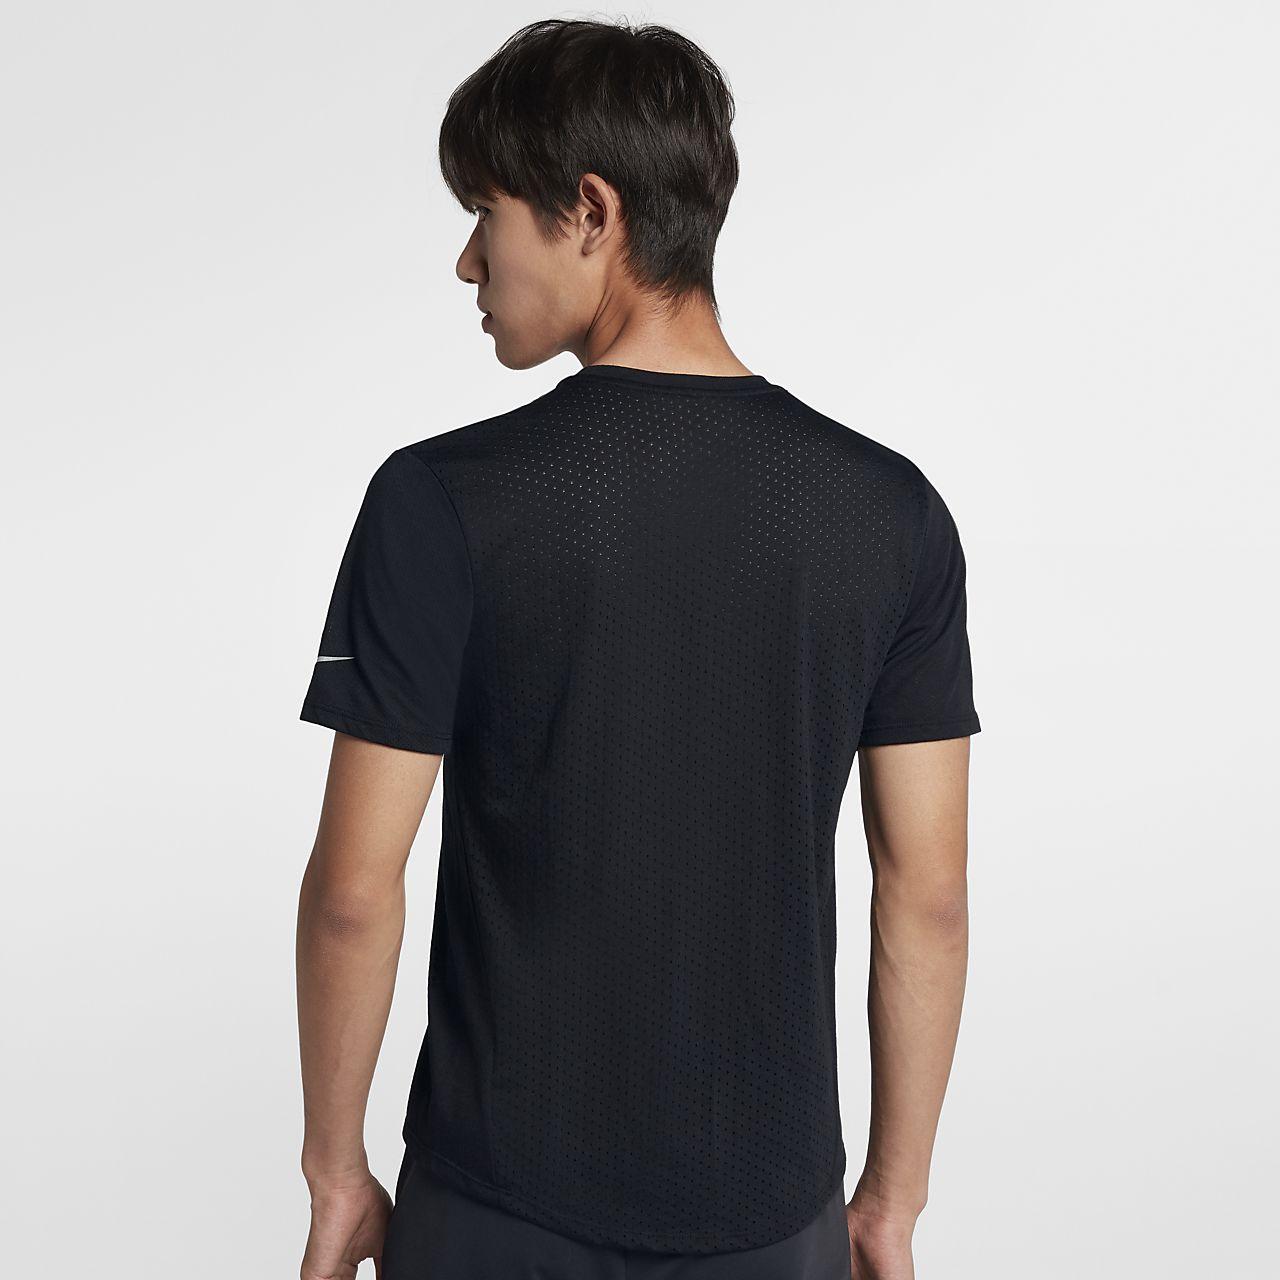 539eeffc Nike Rise 365 Men's Short-Sleeve Running Top. Nike.com LU